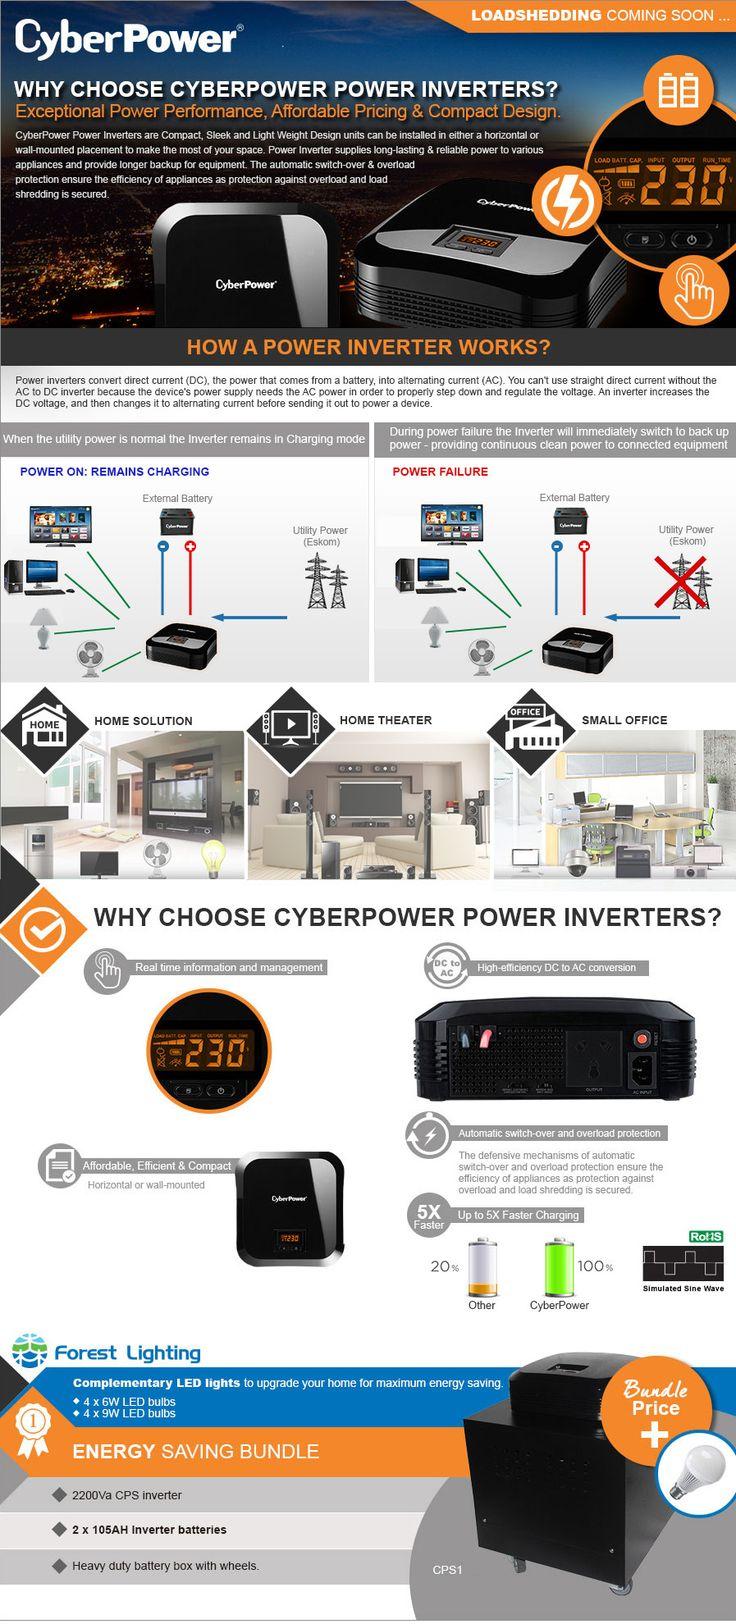 How an Power Inverter works